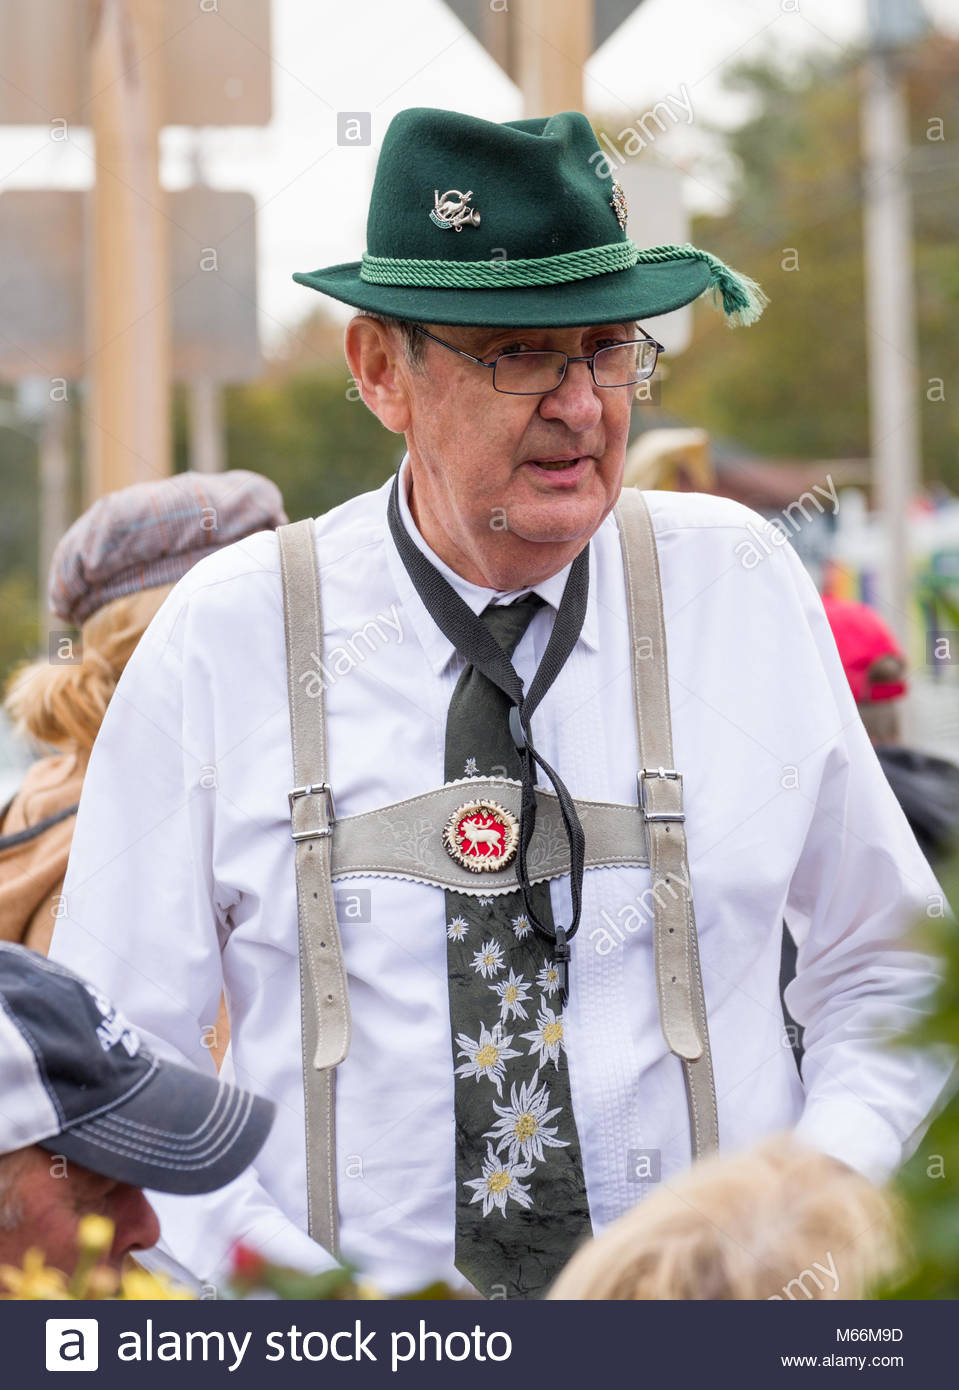 Man wearing lederhosen and Bavarian hat, Main Street, Ogunquit, York County, Maine, USA - Stock Image